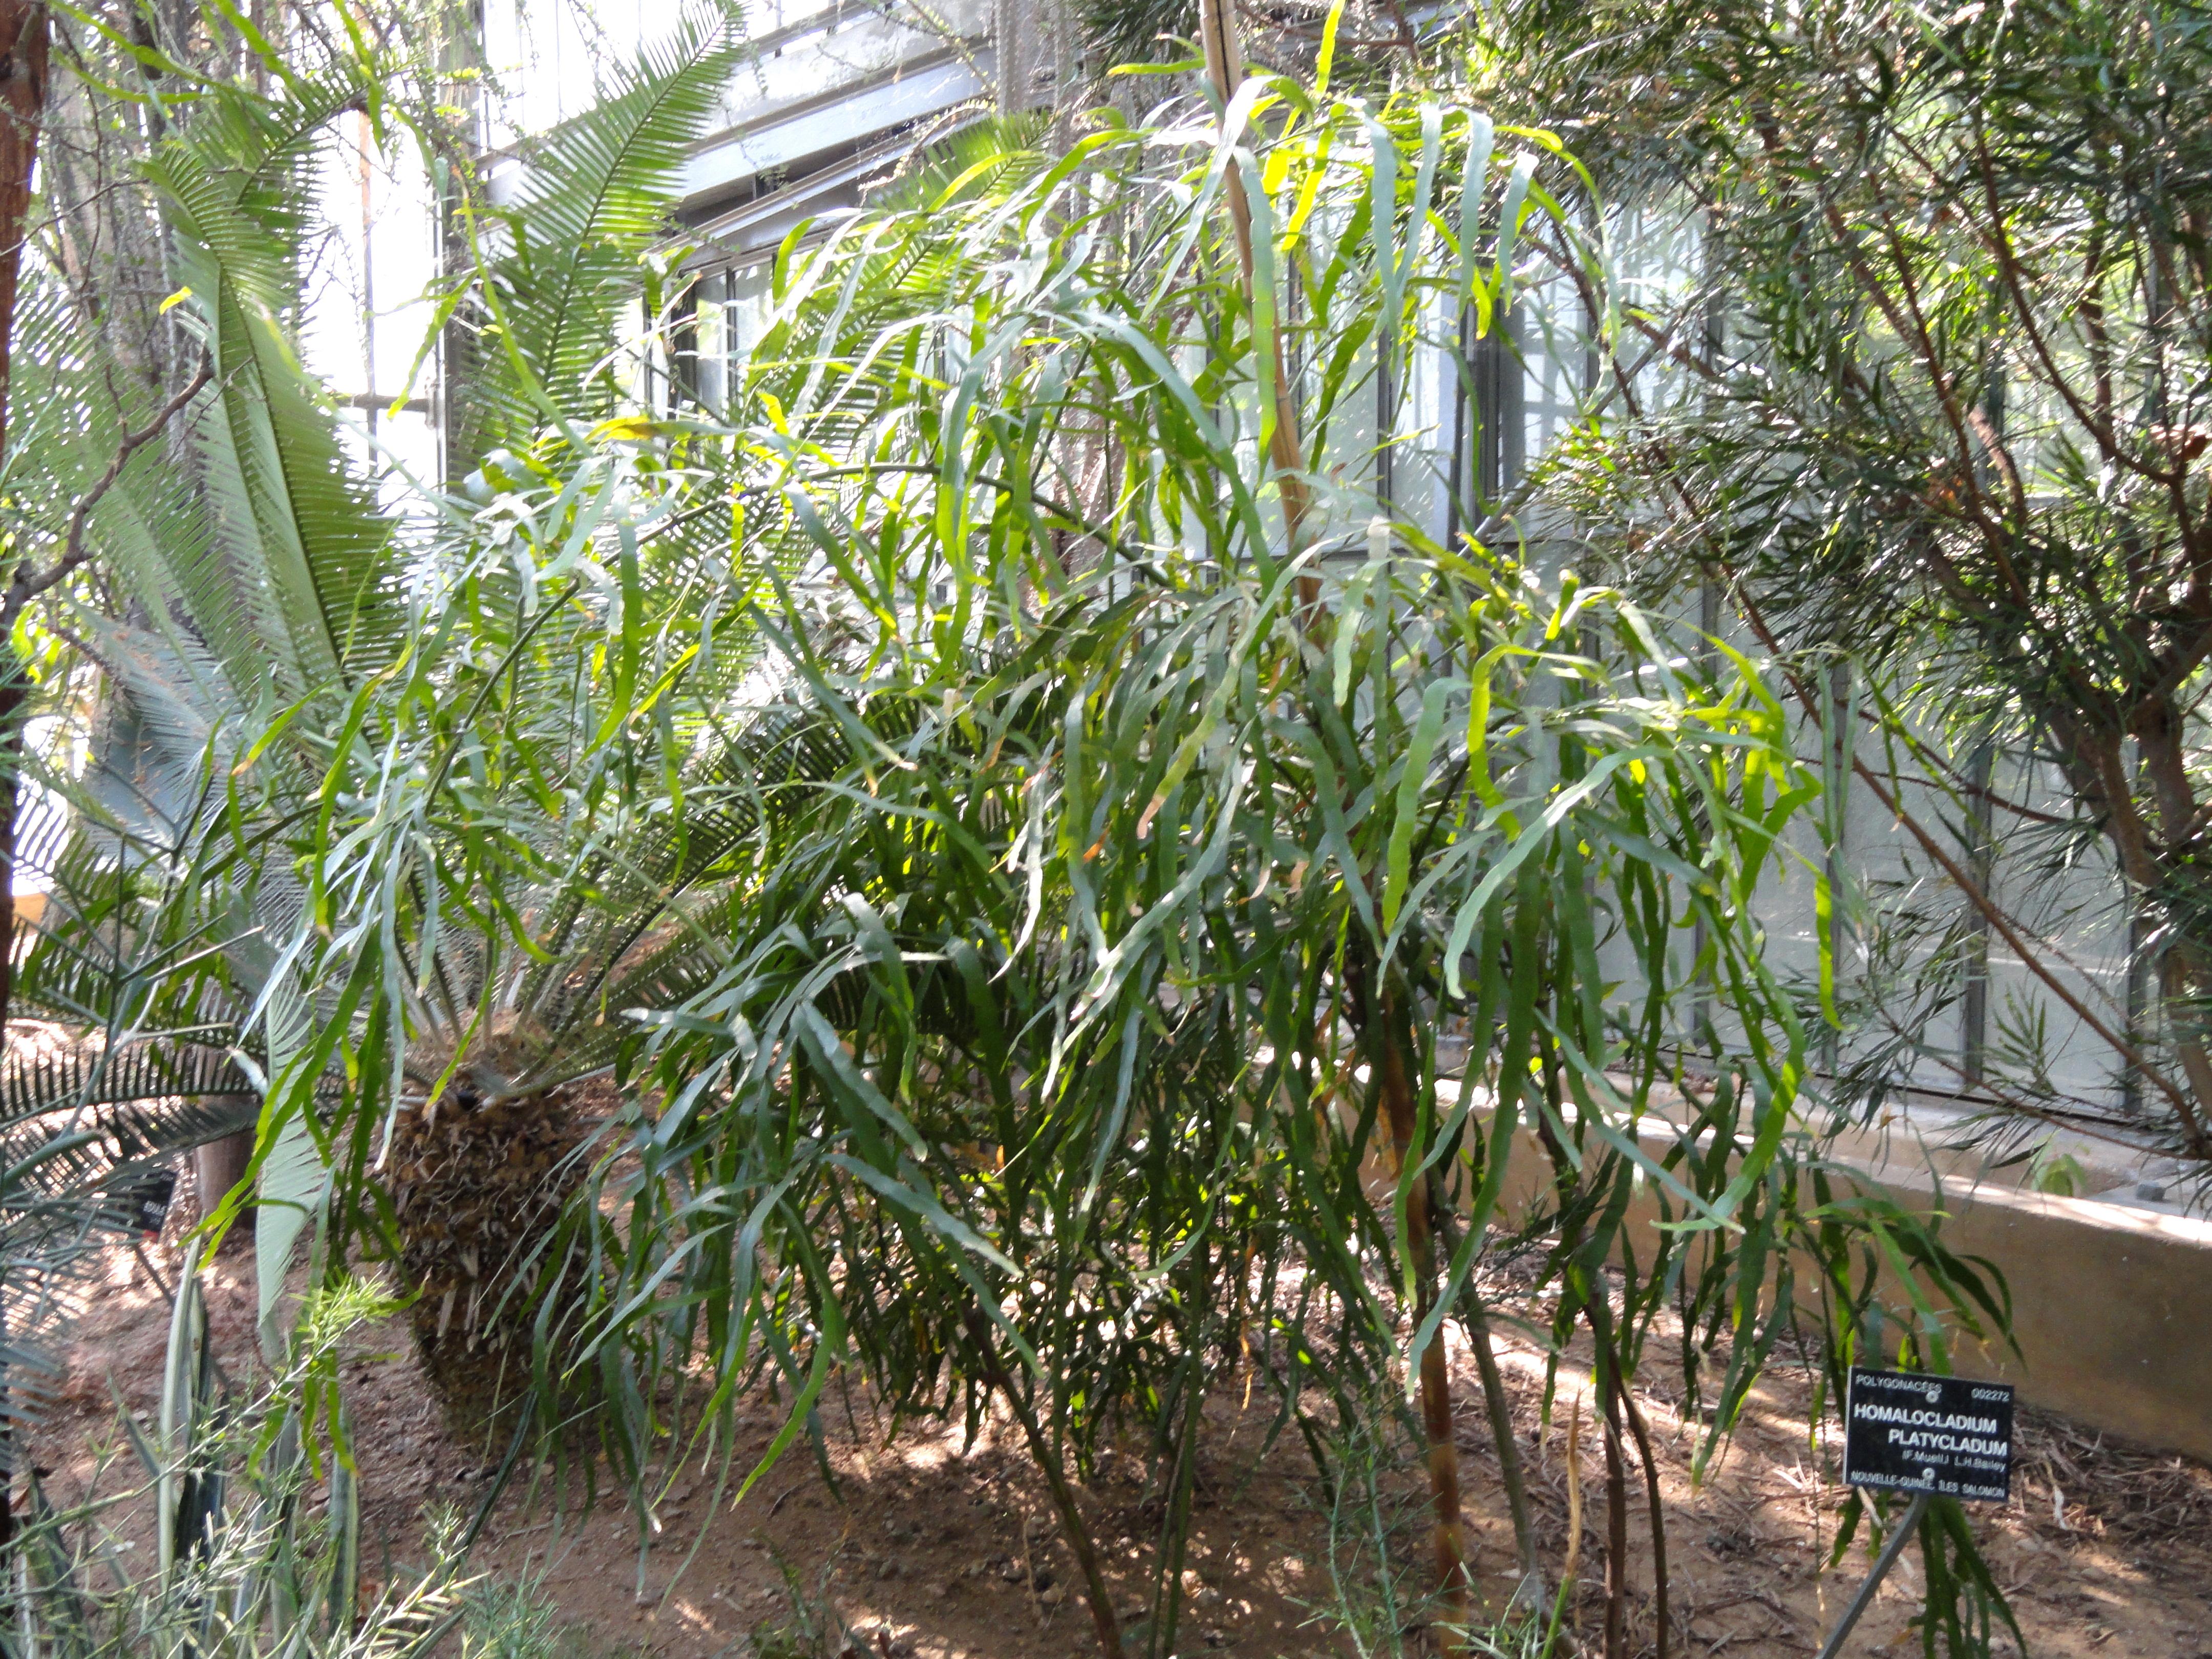 file homalocladium platycladum jardin botanique de lyon. Black Bedroom Furniture Sets. Home Design Ideas